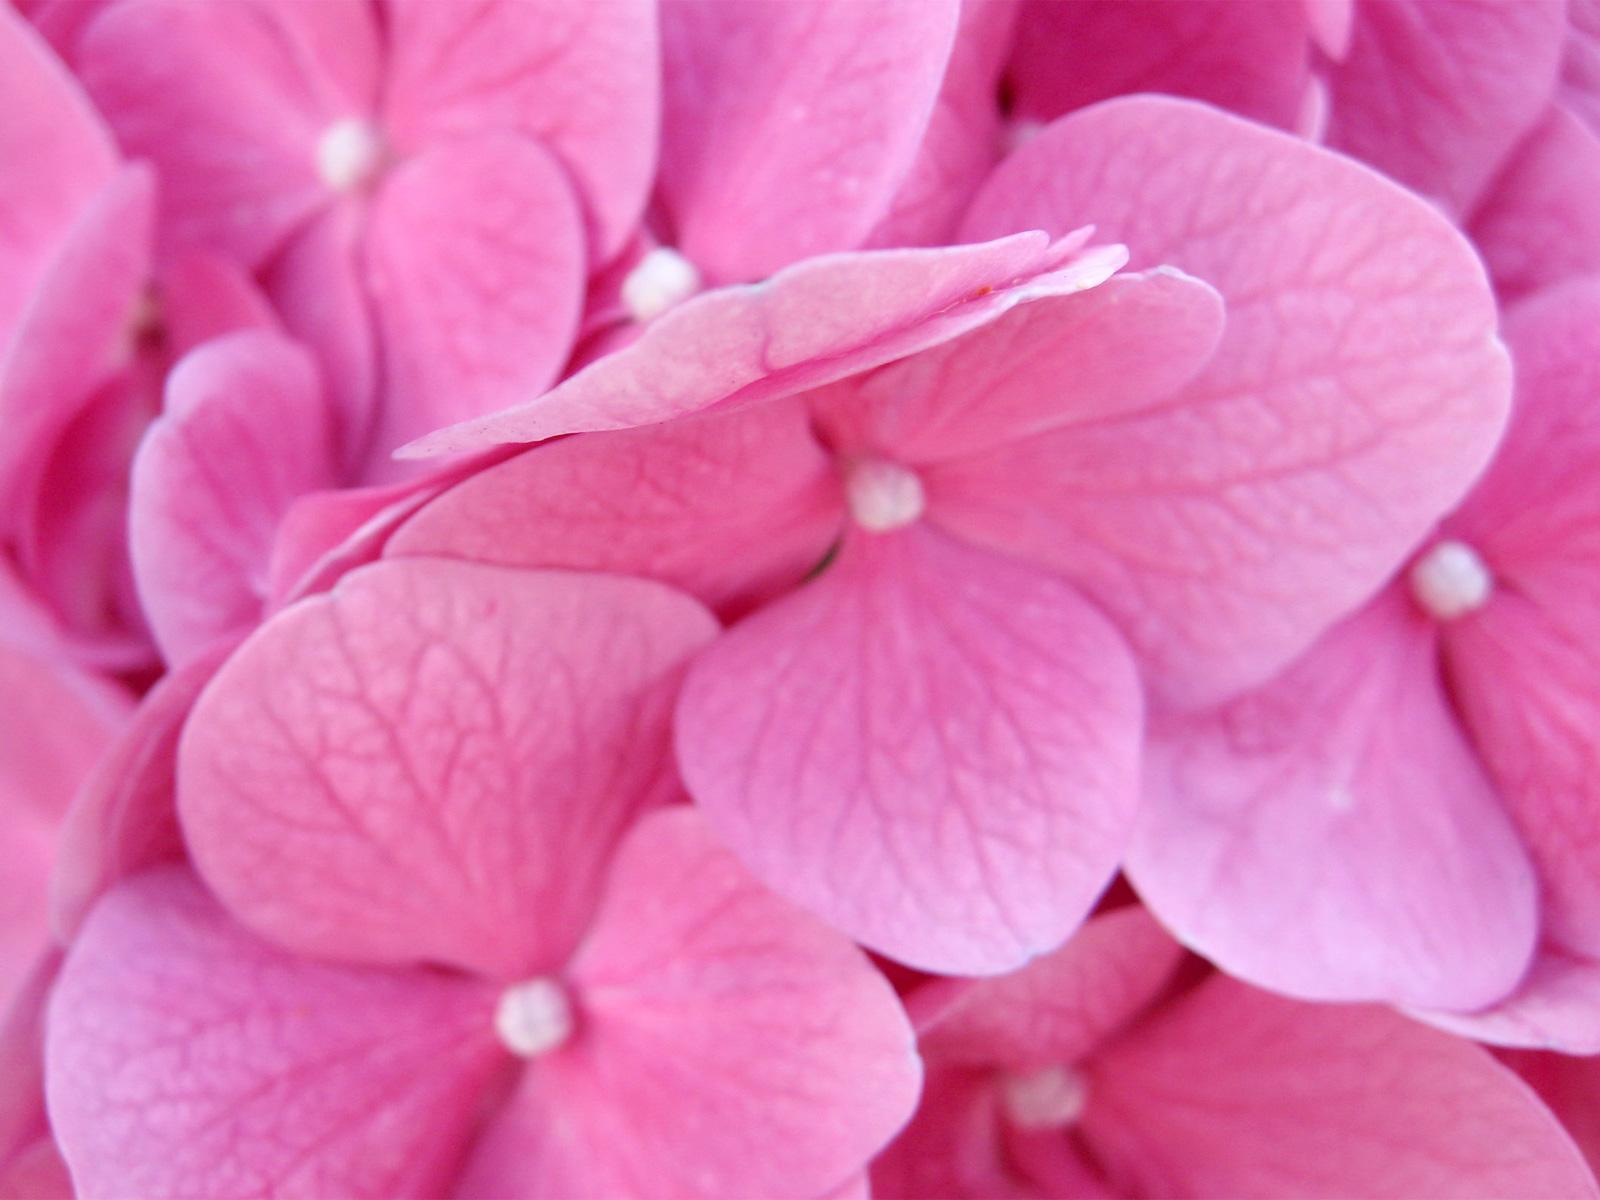 http://4.bp.blogspot.com/_AZ-pi-pN11Y/TKLInGVhroI/AAAAAAAAABc/byzlIY8I-vw/s1600/Pink_Hydrangea_Flower.jpg